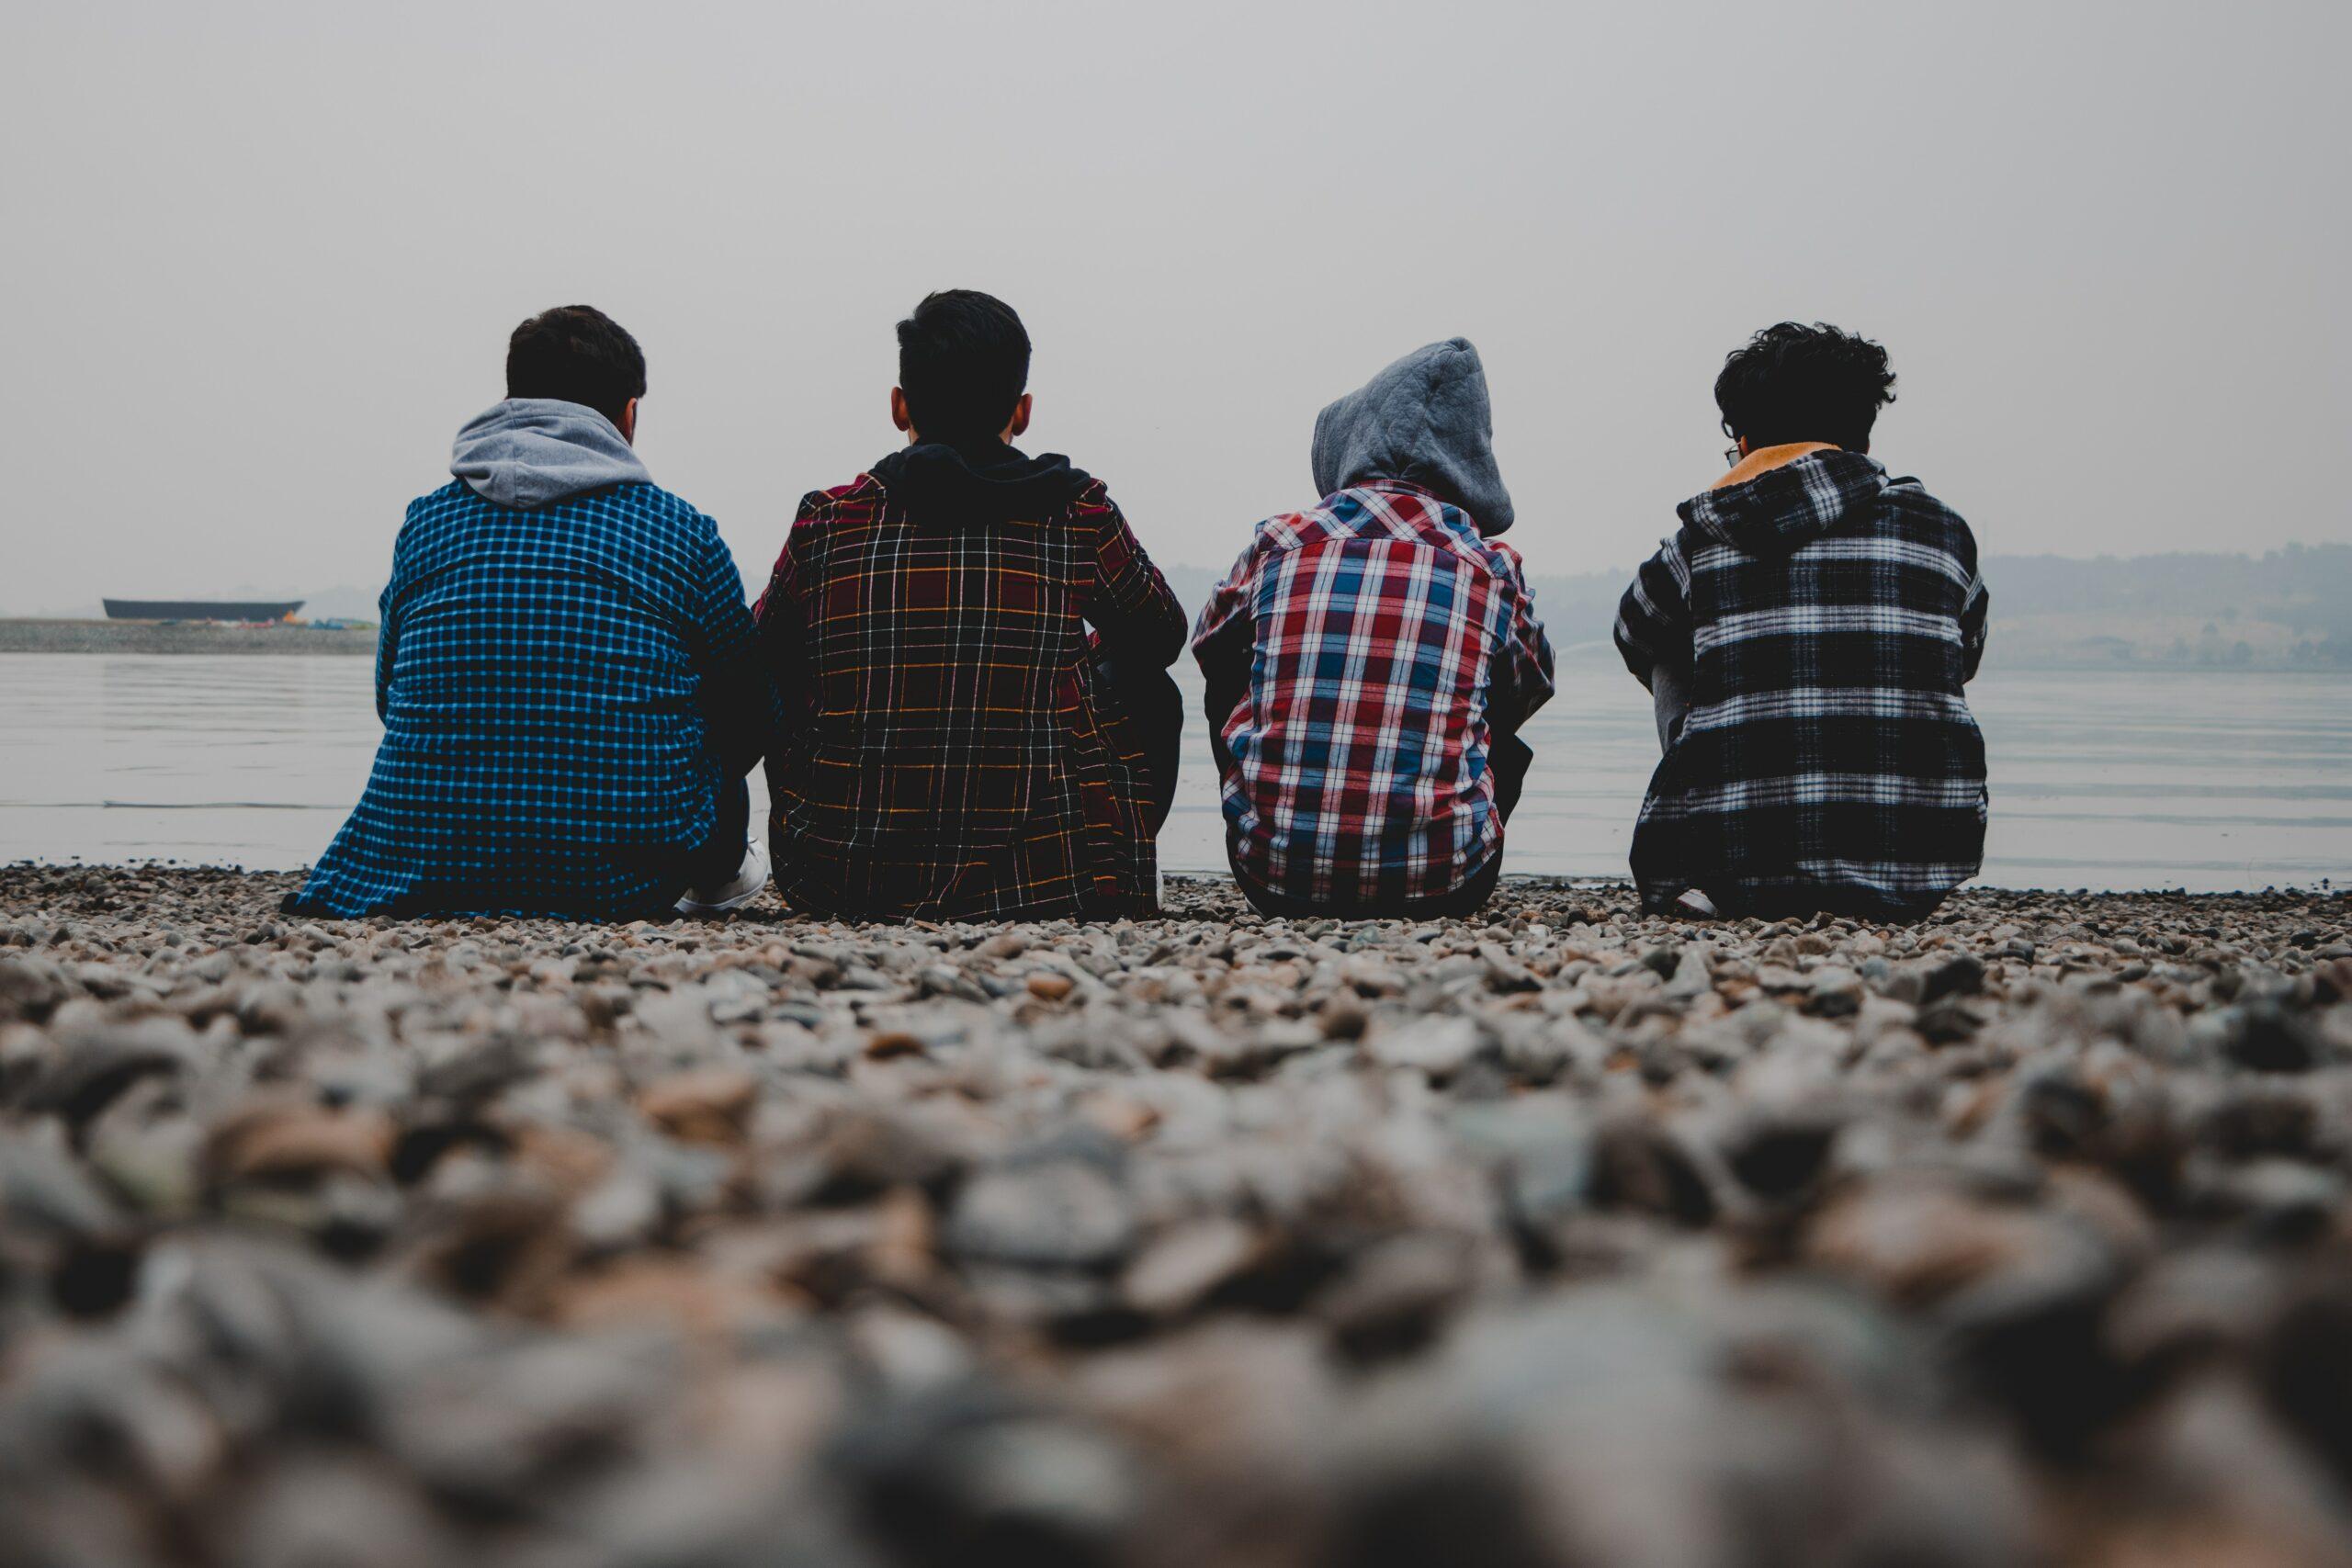 Teenagers often feel anxiety